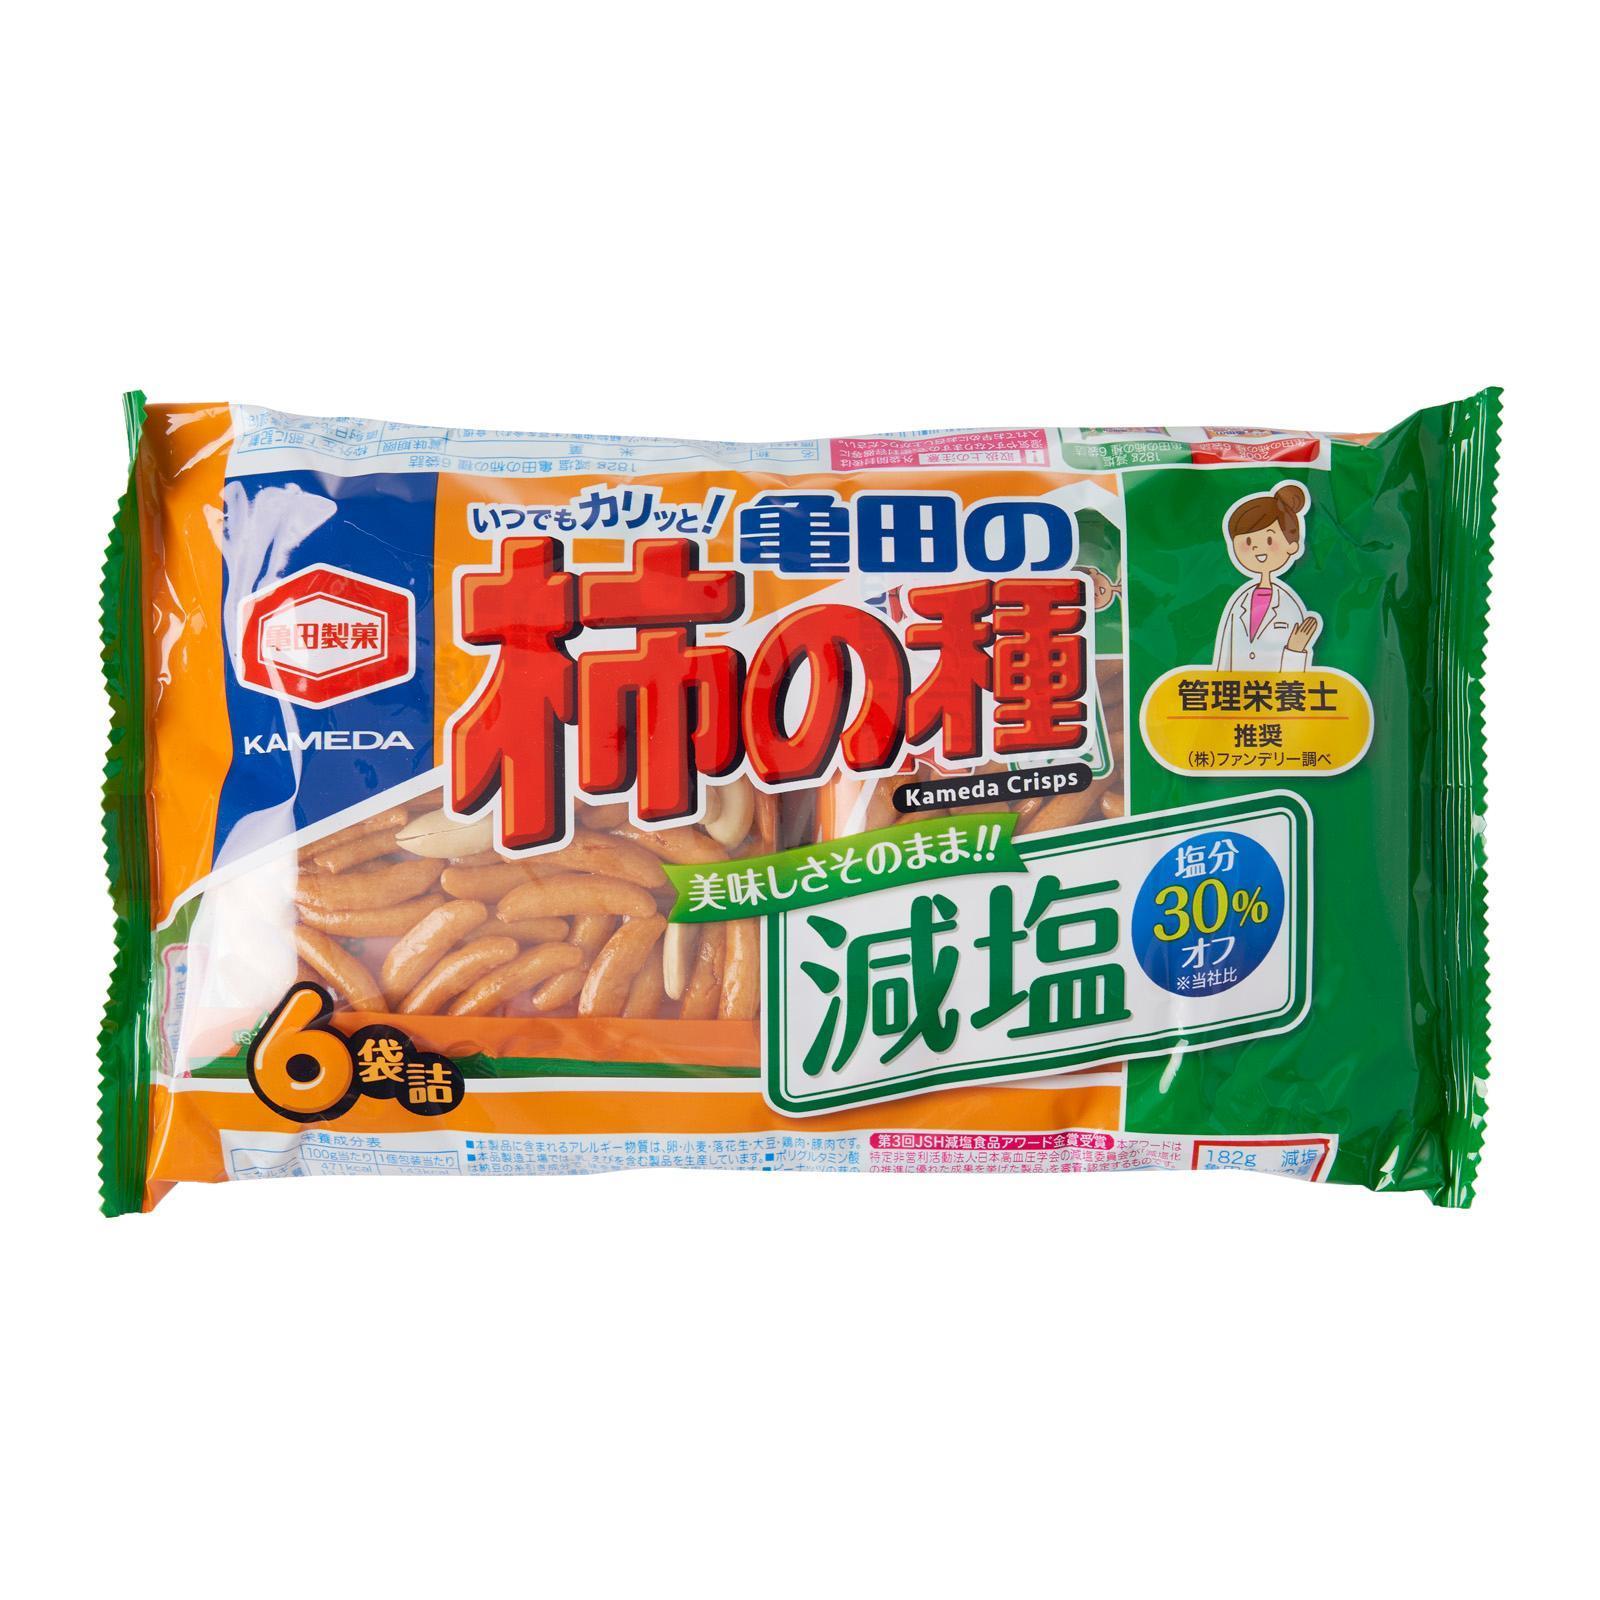 Kameda Pride Less Salted Kaki Seed Snack